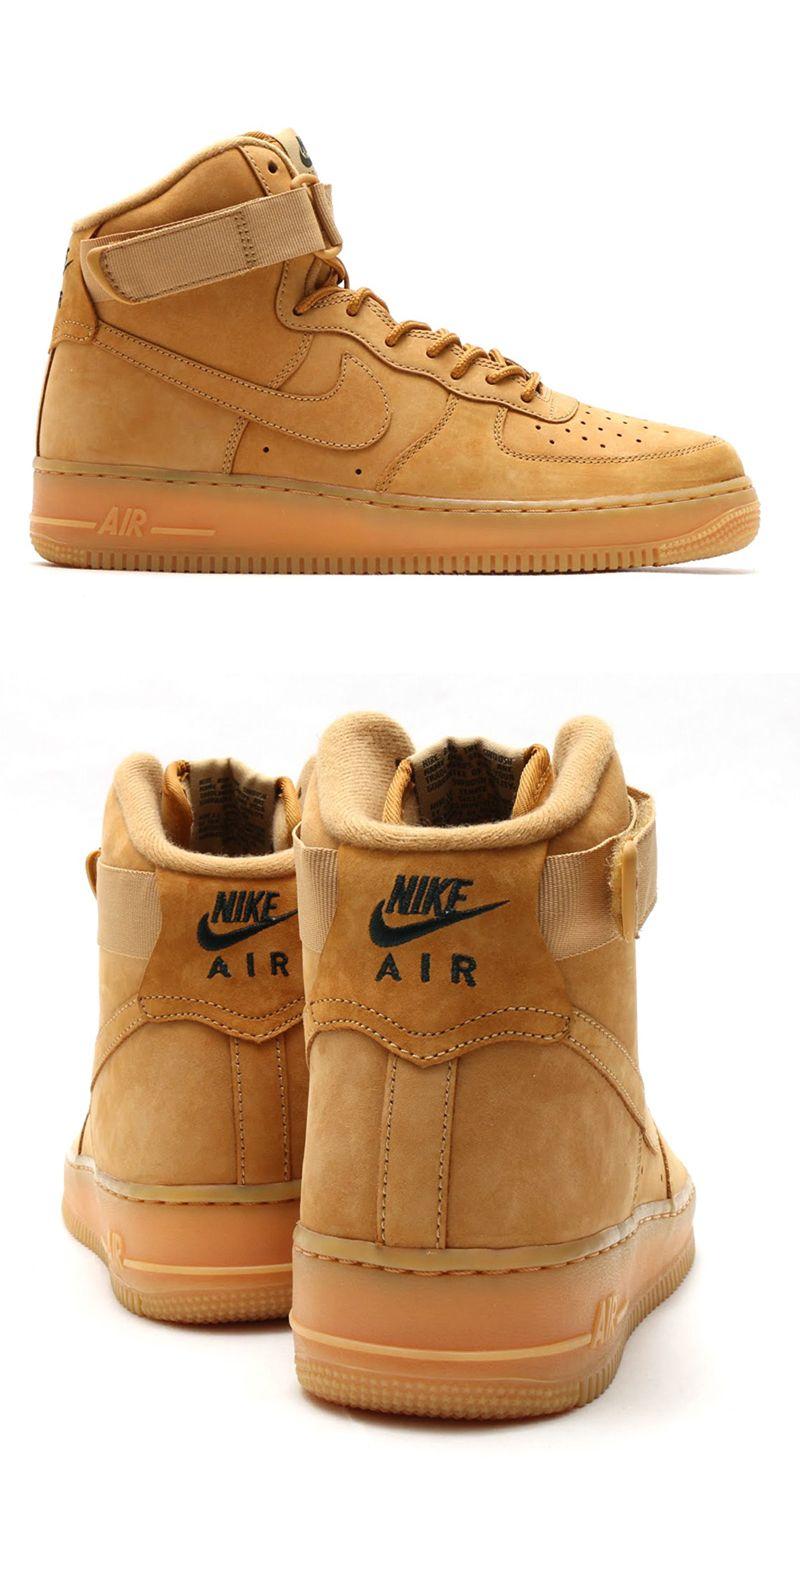 Calzado NikeZapatillas Y Best Para Hombre OnKicks Nike Shoes OPXZuki